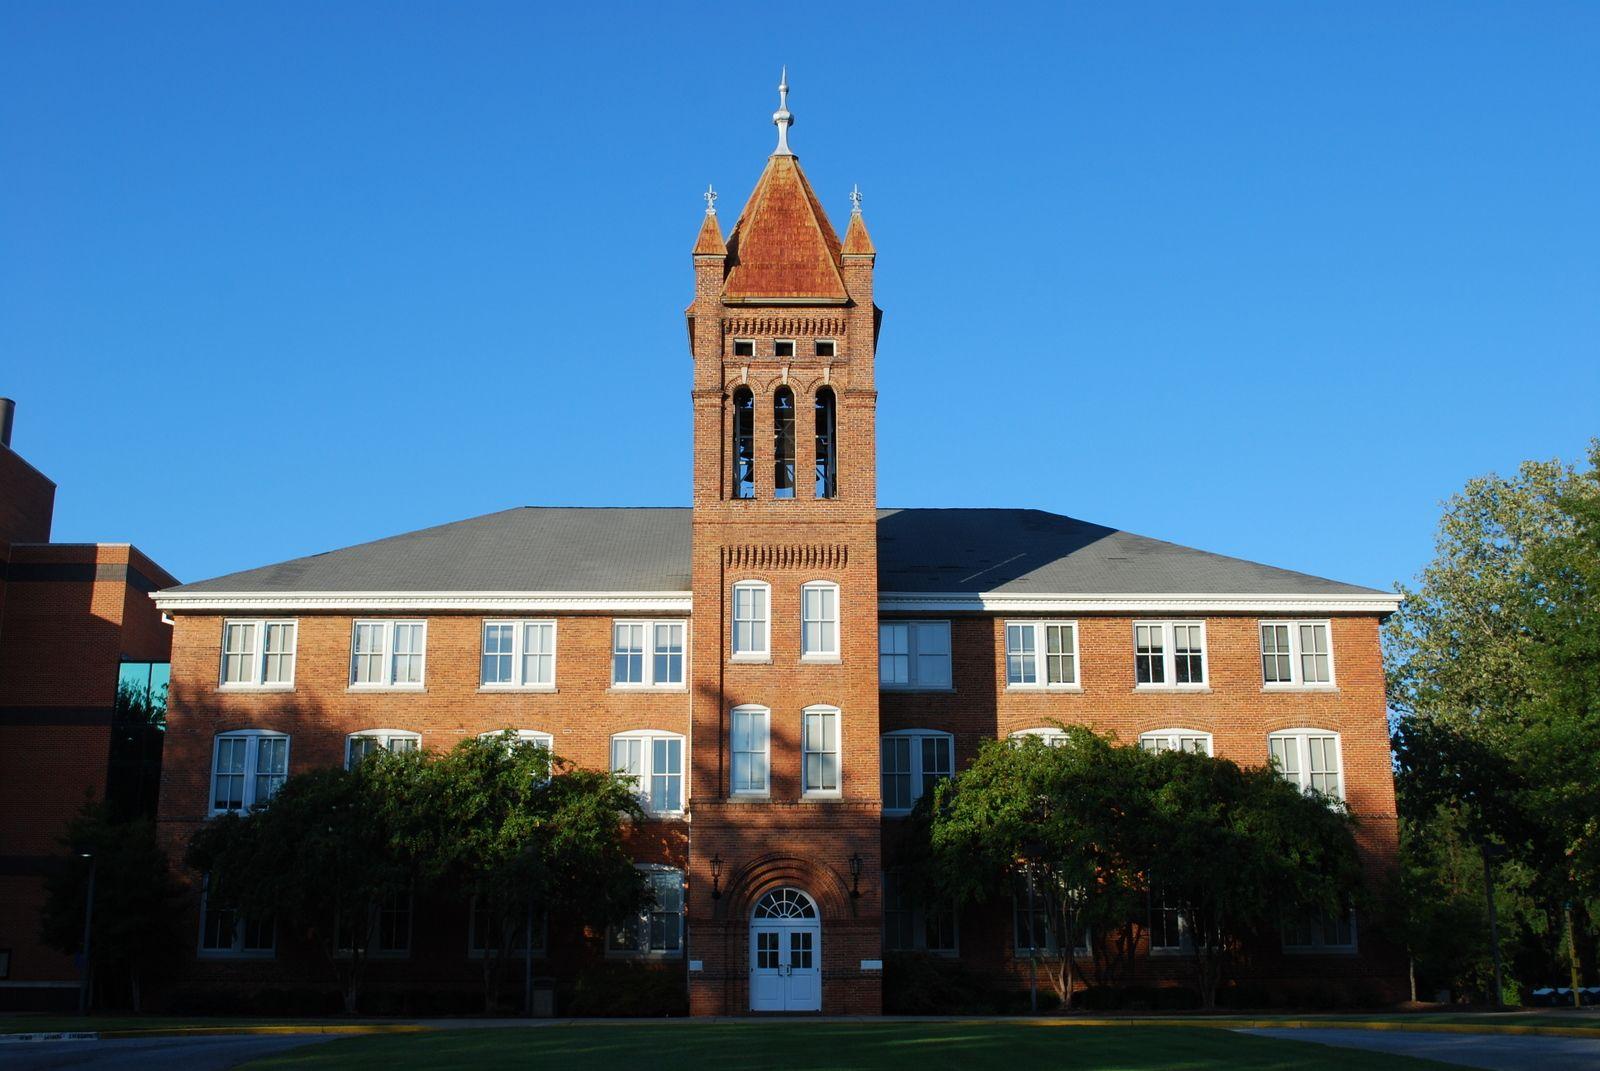 Town And Country Greenwood Sc >> Old Main Lander University Greenwood Sc Favorite